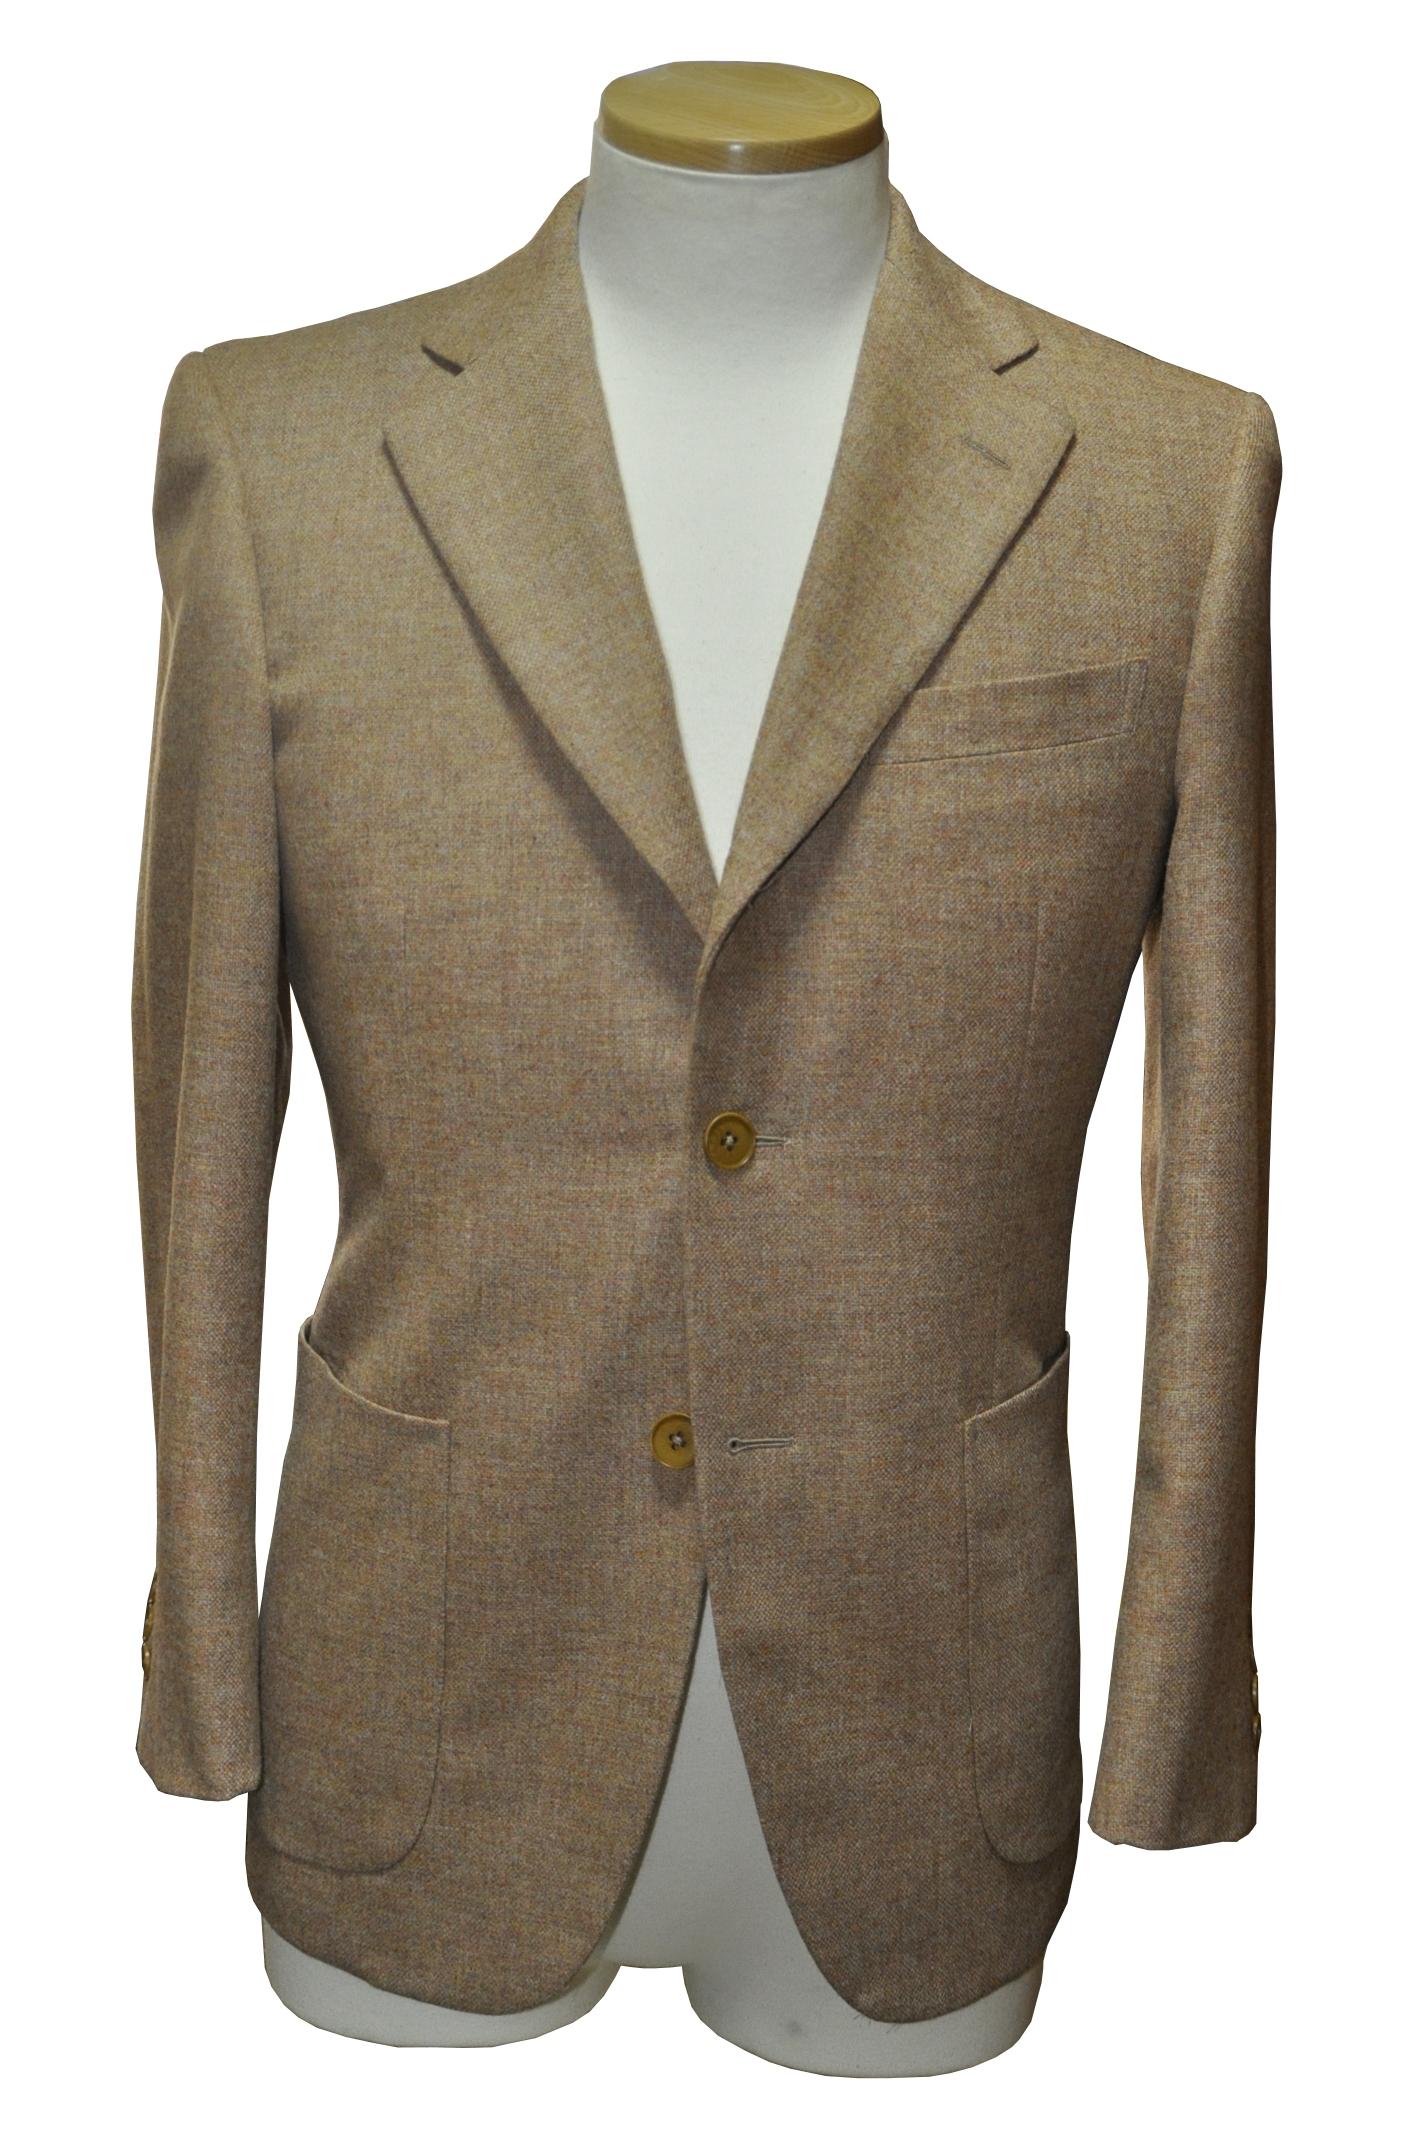 kj11 ジャケットの形状